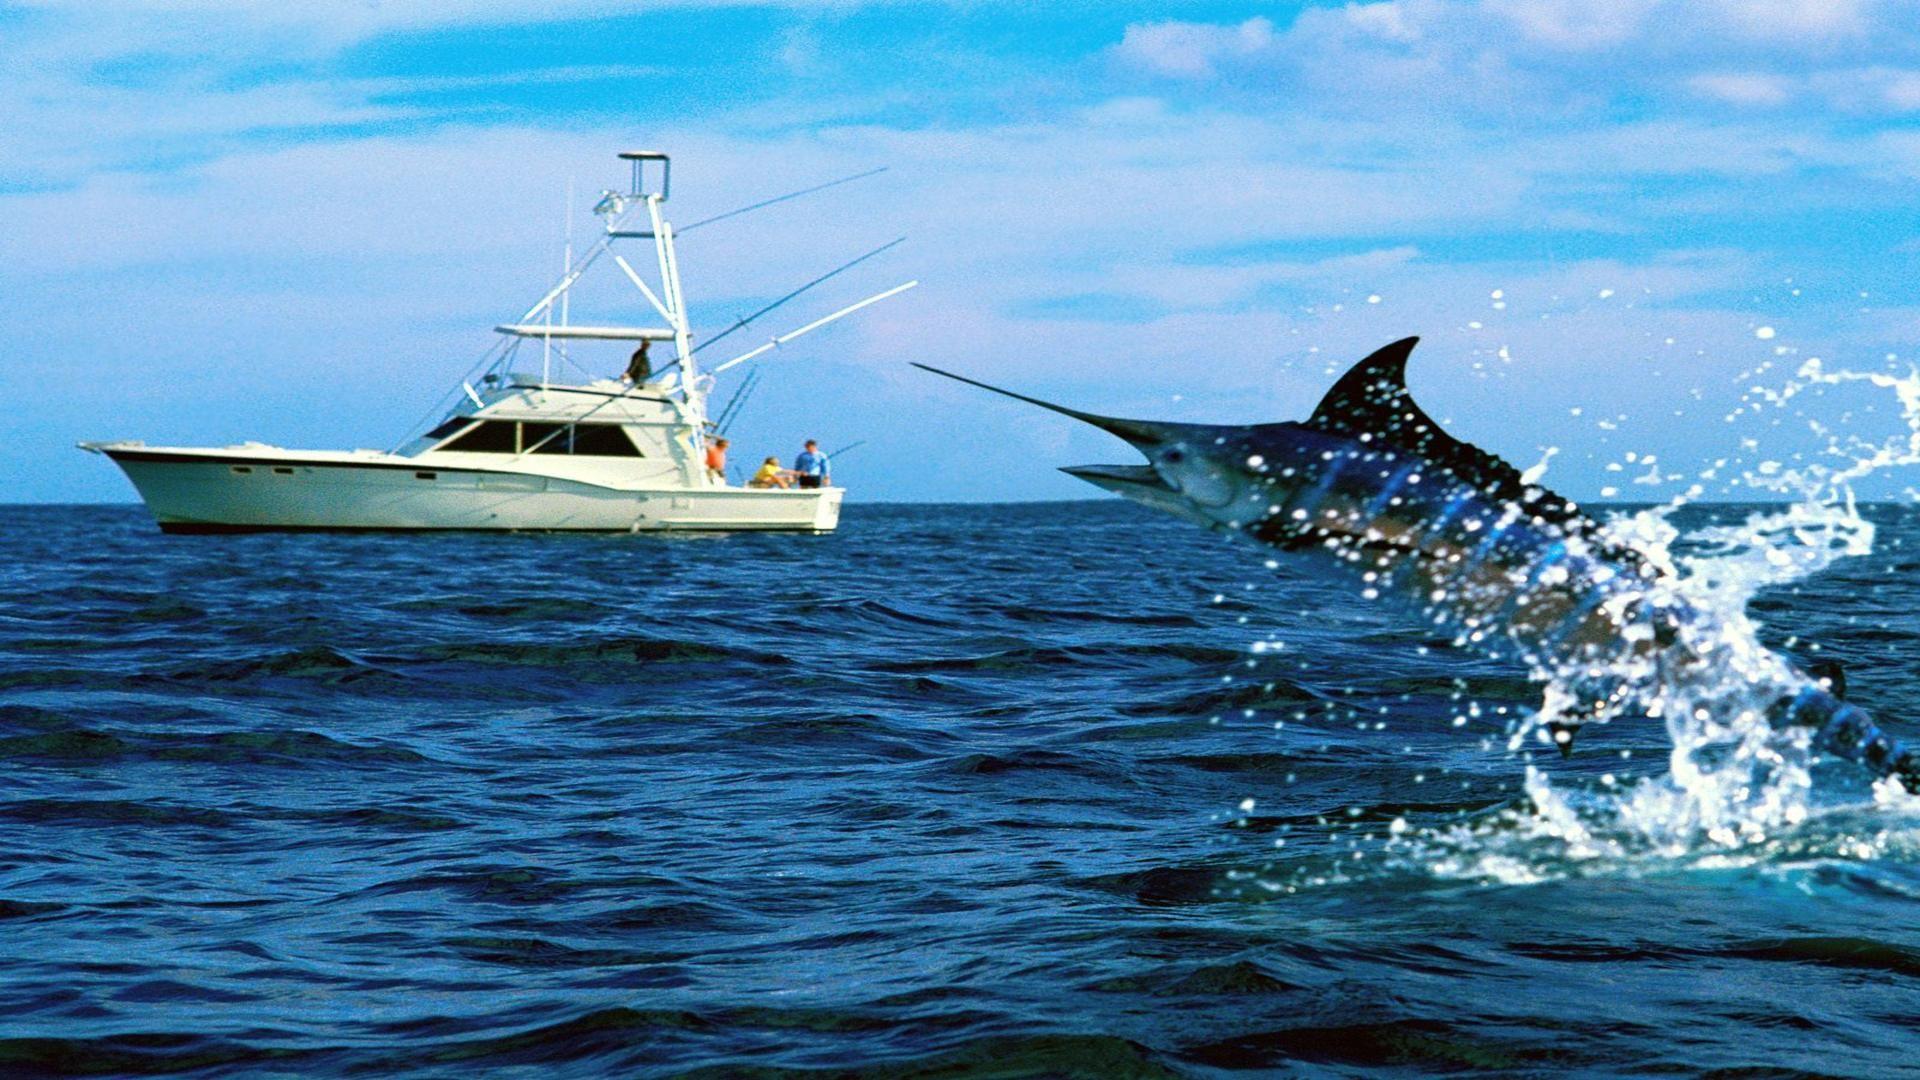 fish marlin desktop 1920x1200 - photo #22